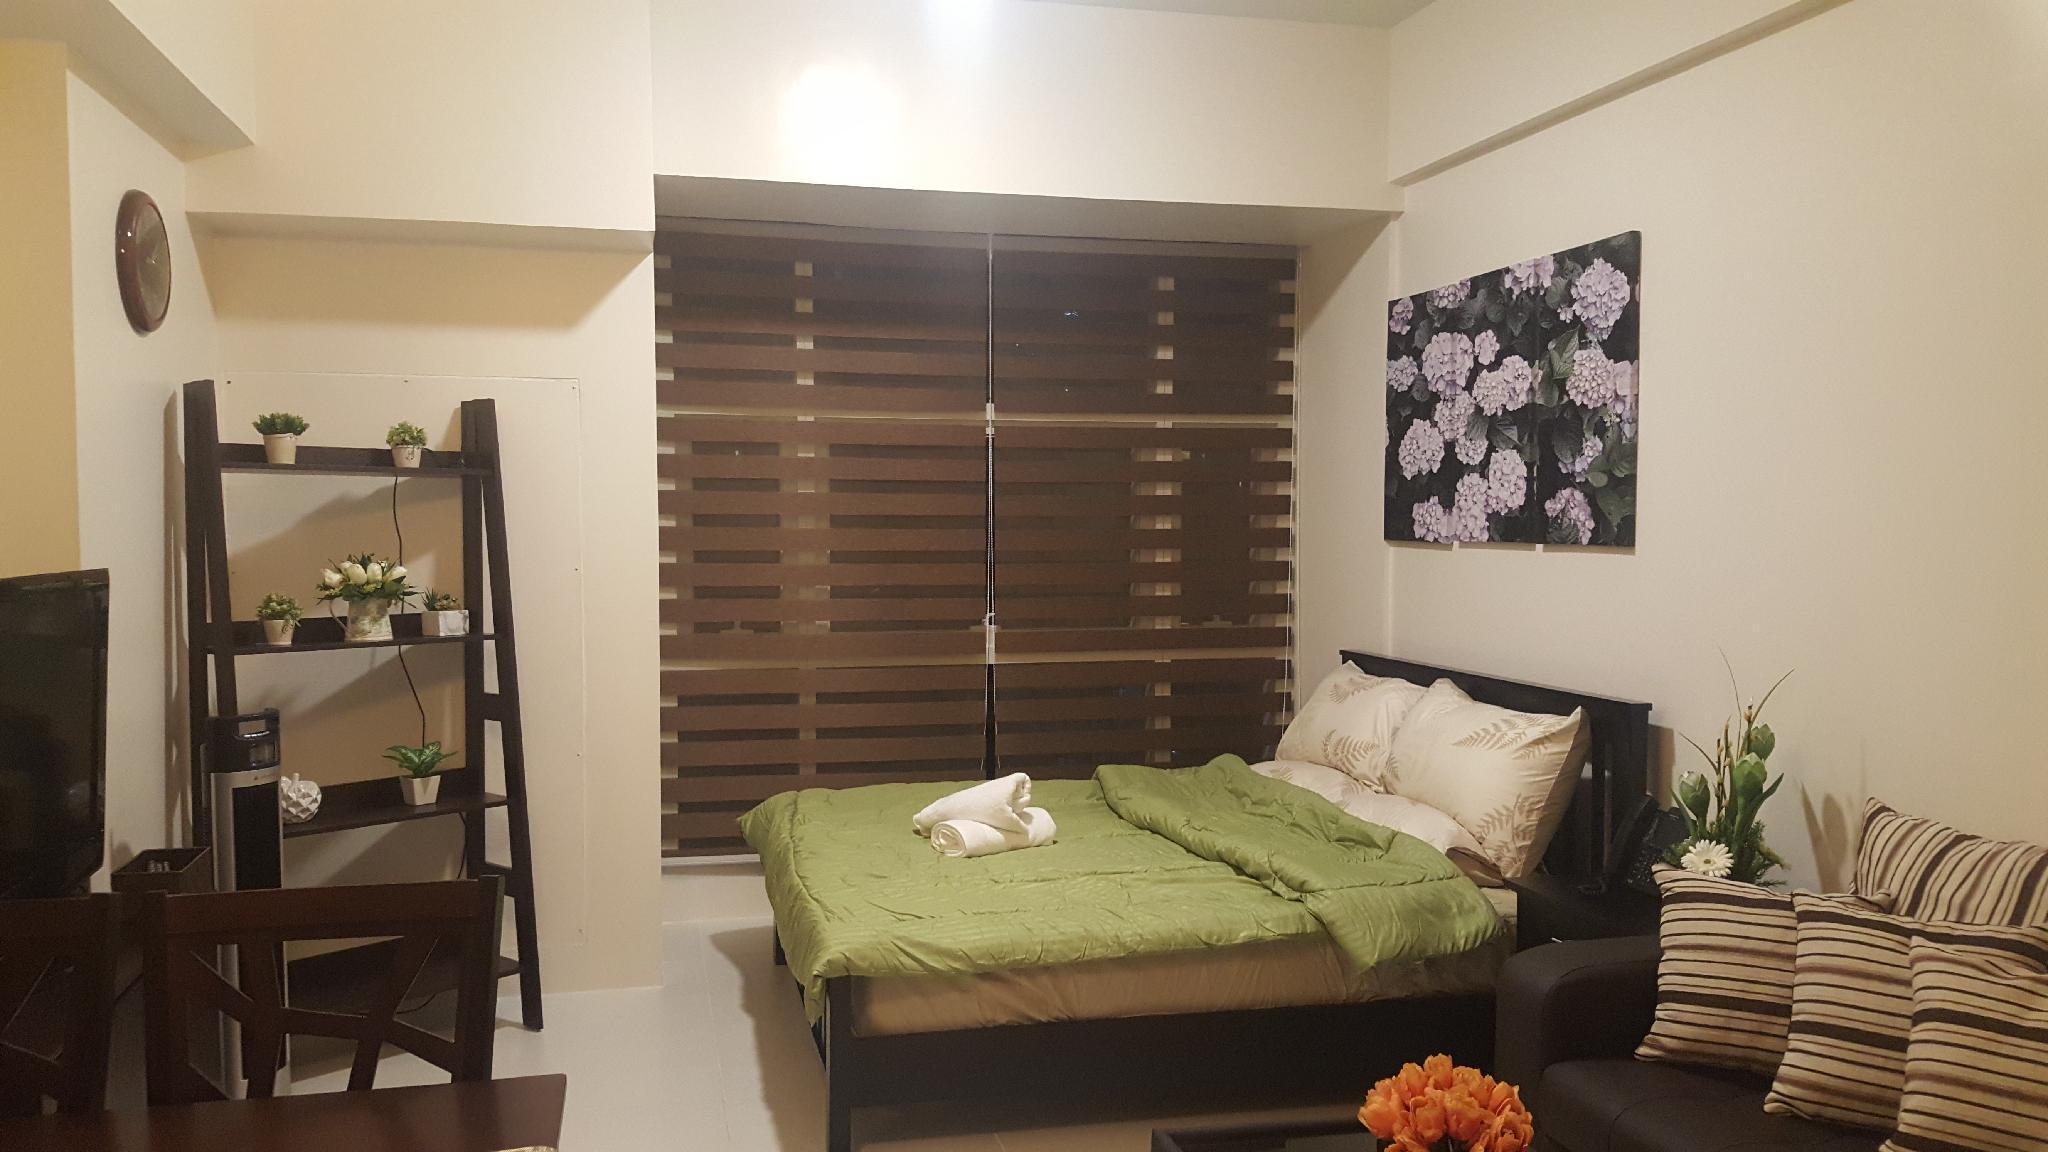 Studio Unit At Twin Oaks Place Manila Philippines